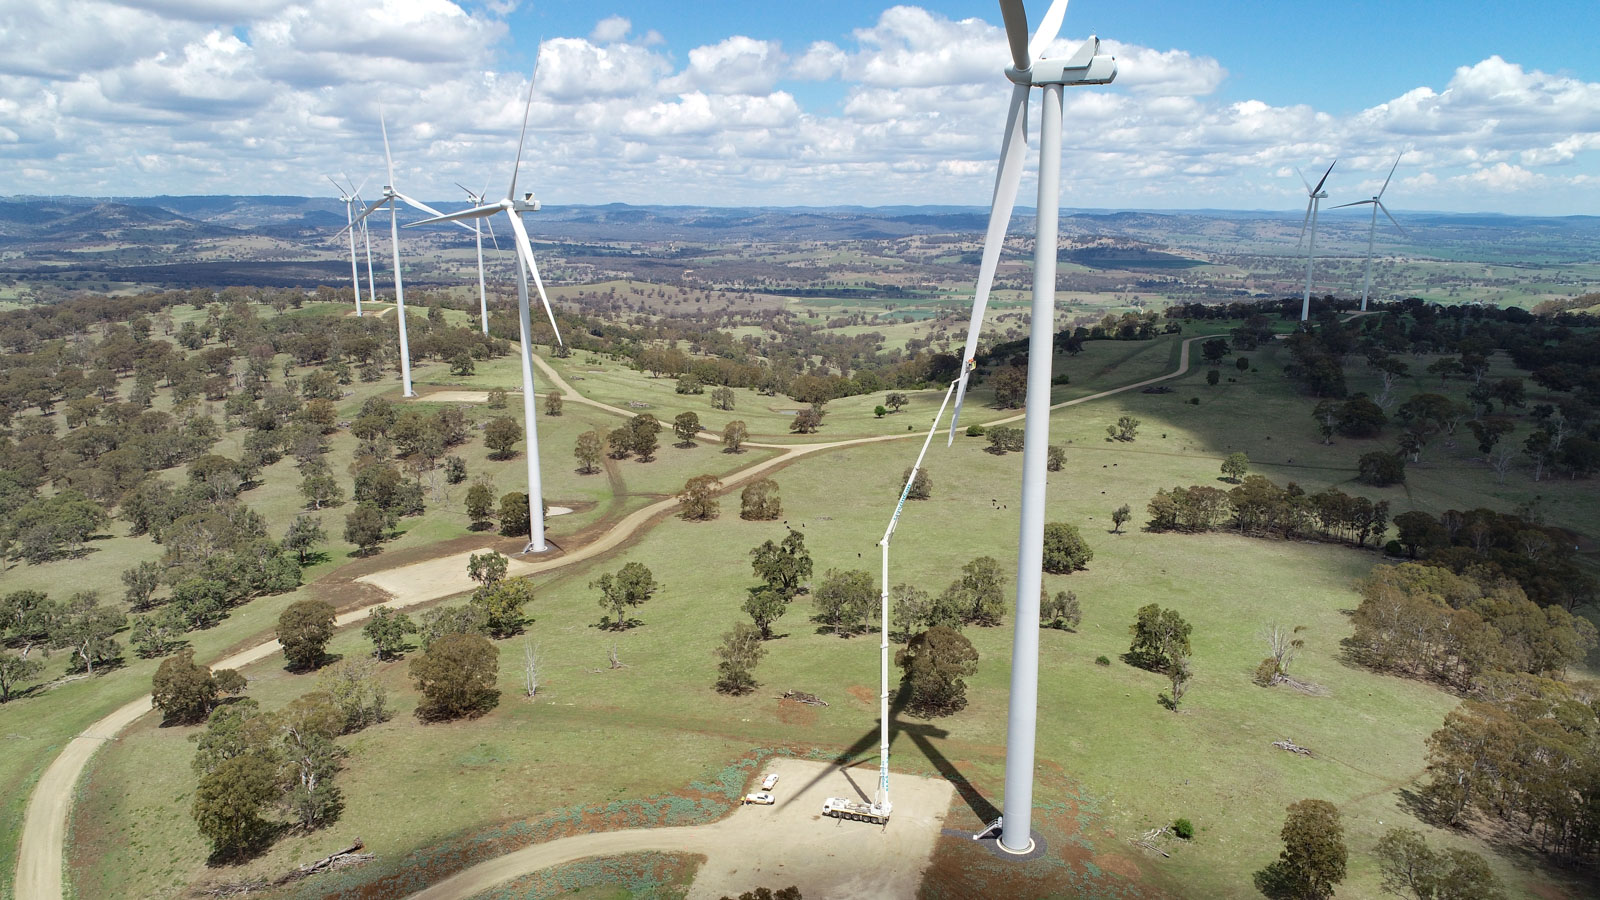 103m Mobile crane reaching a turbine